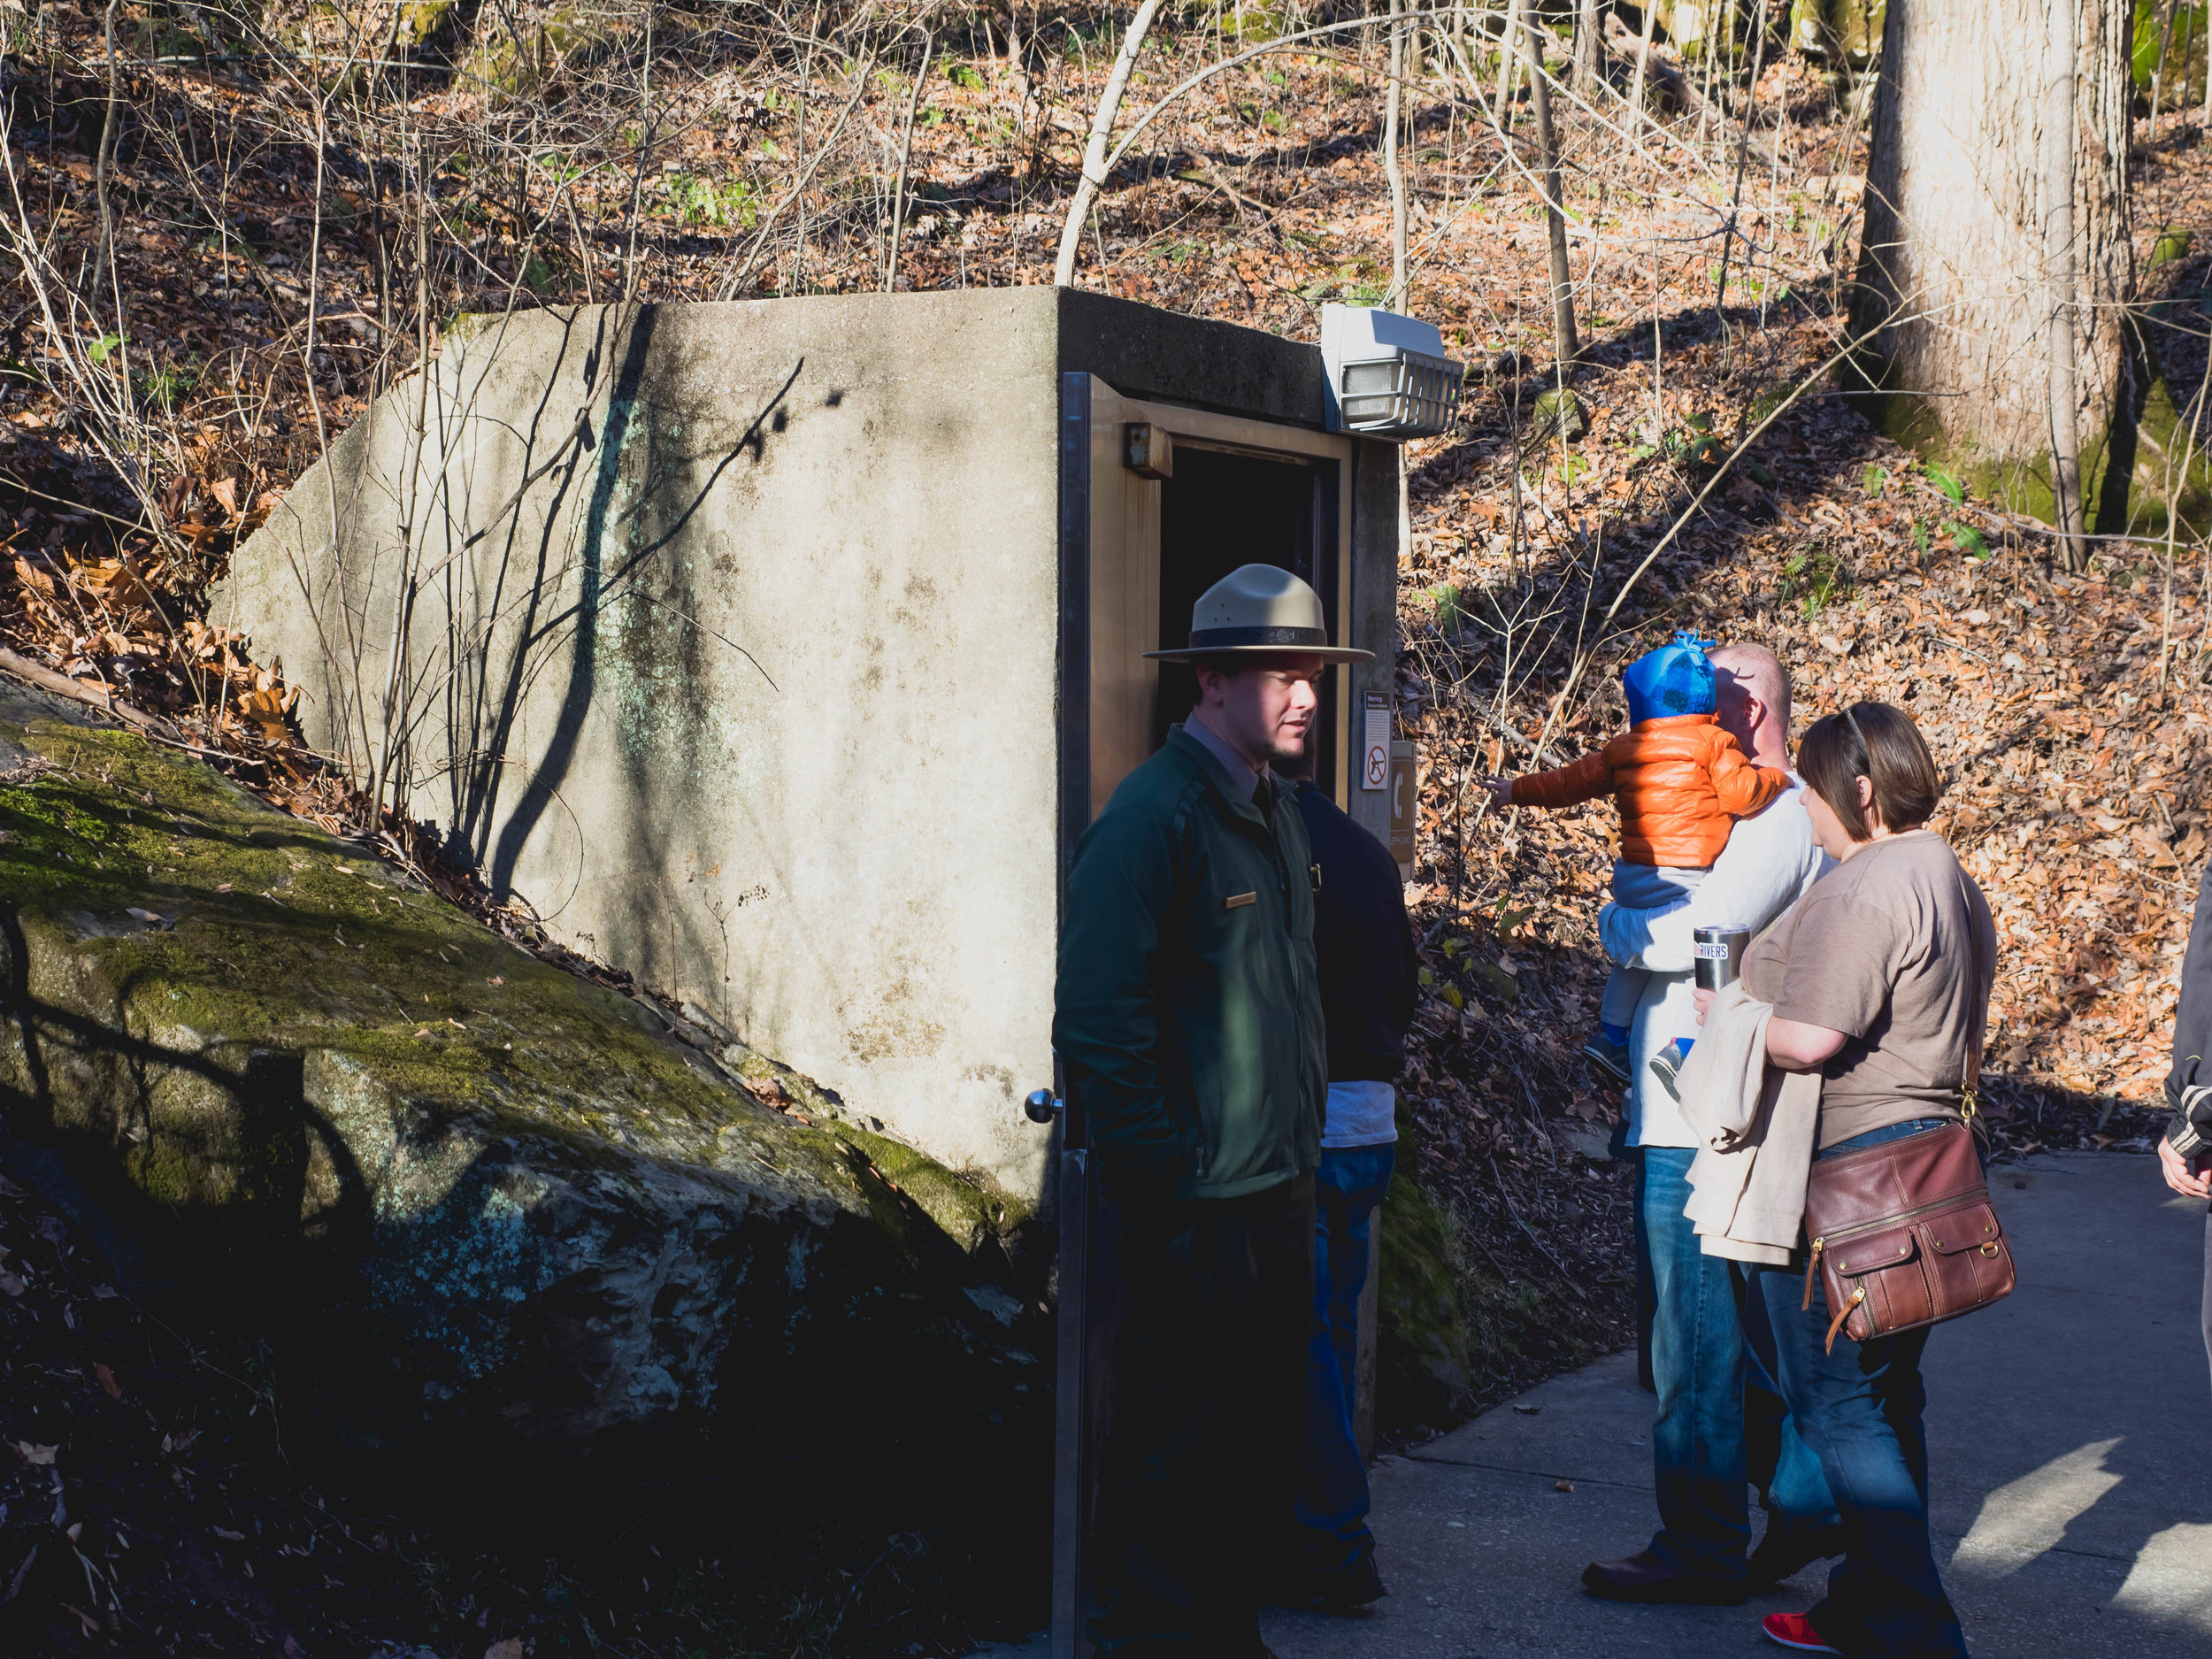 D&D Tour entrance at Mammoth Cave.